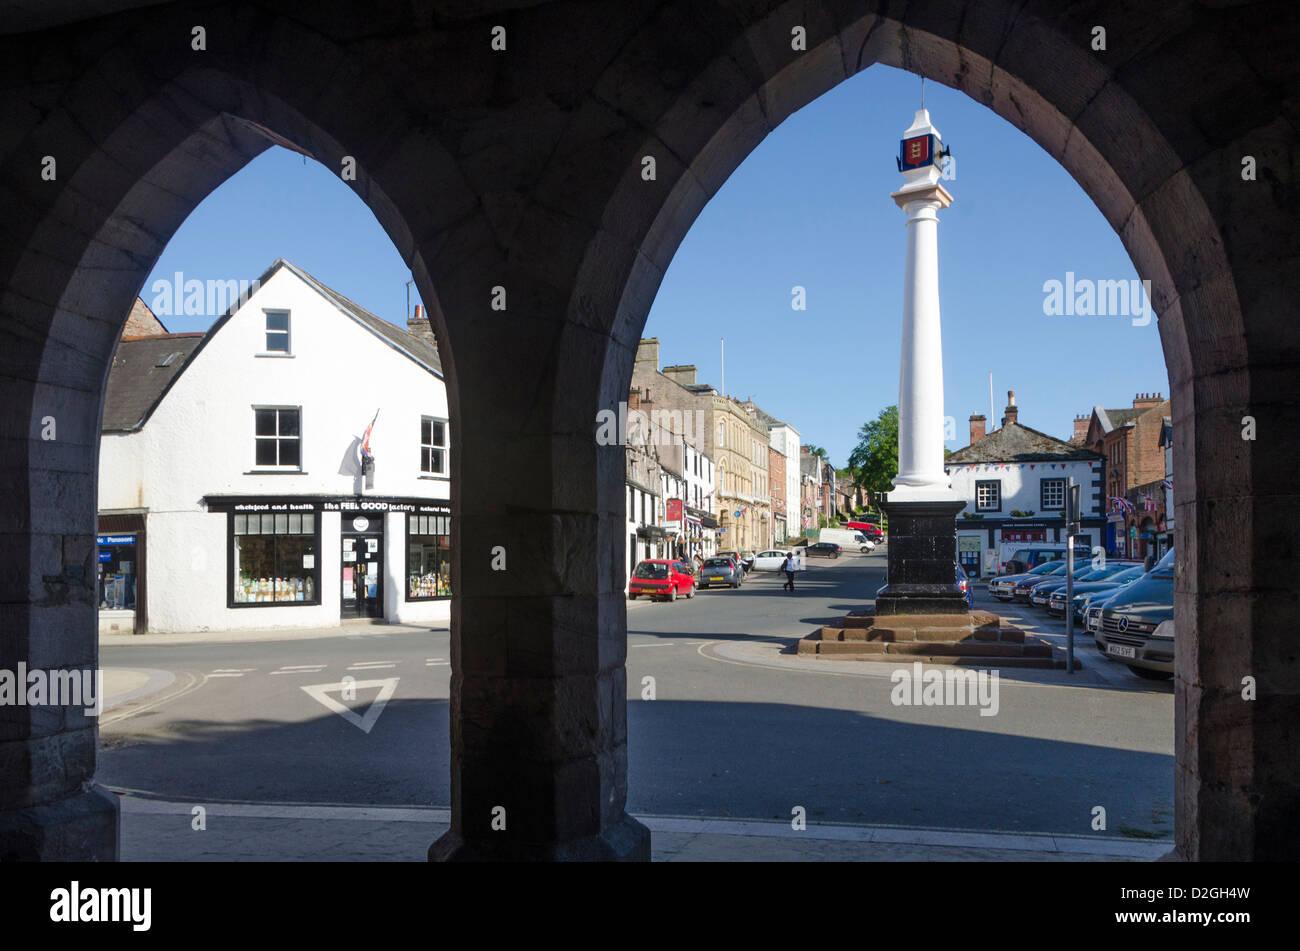 Market Cross, Boroughgate, Appleby-in-Westmorland, Cumbria, England, Britain - Stock Image